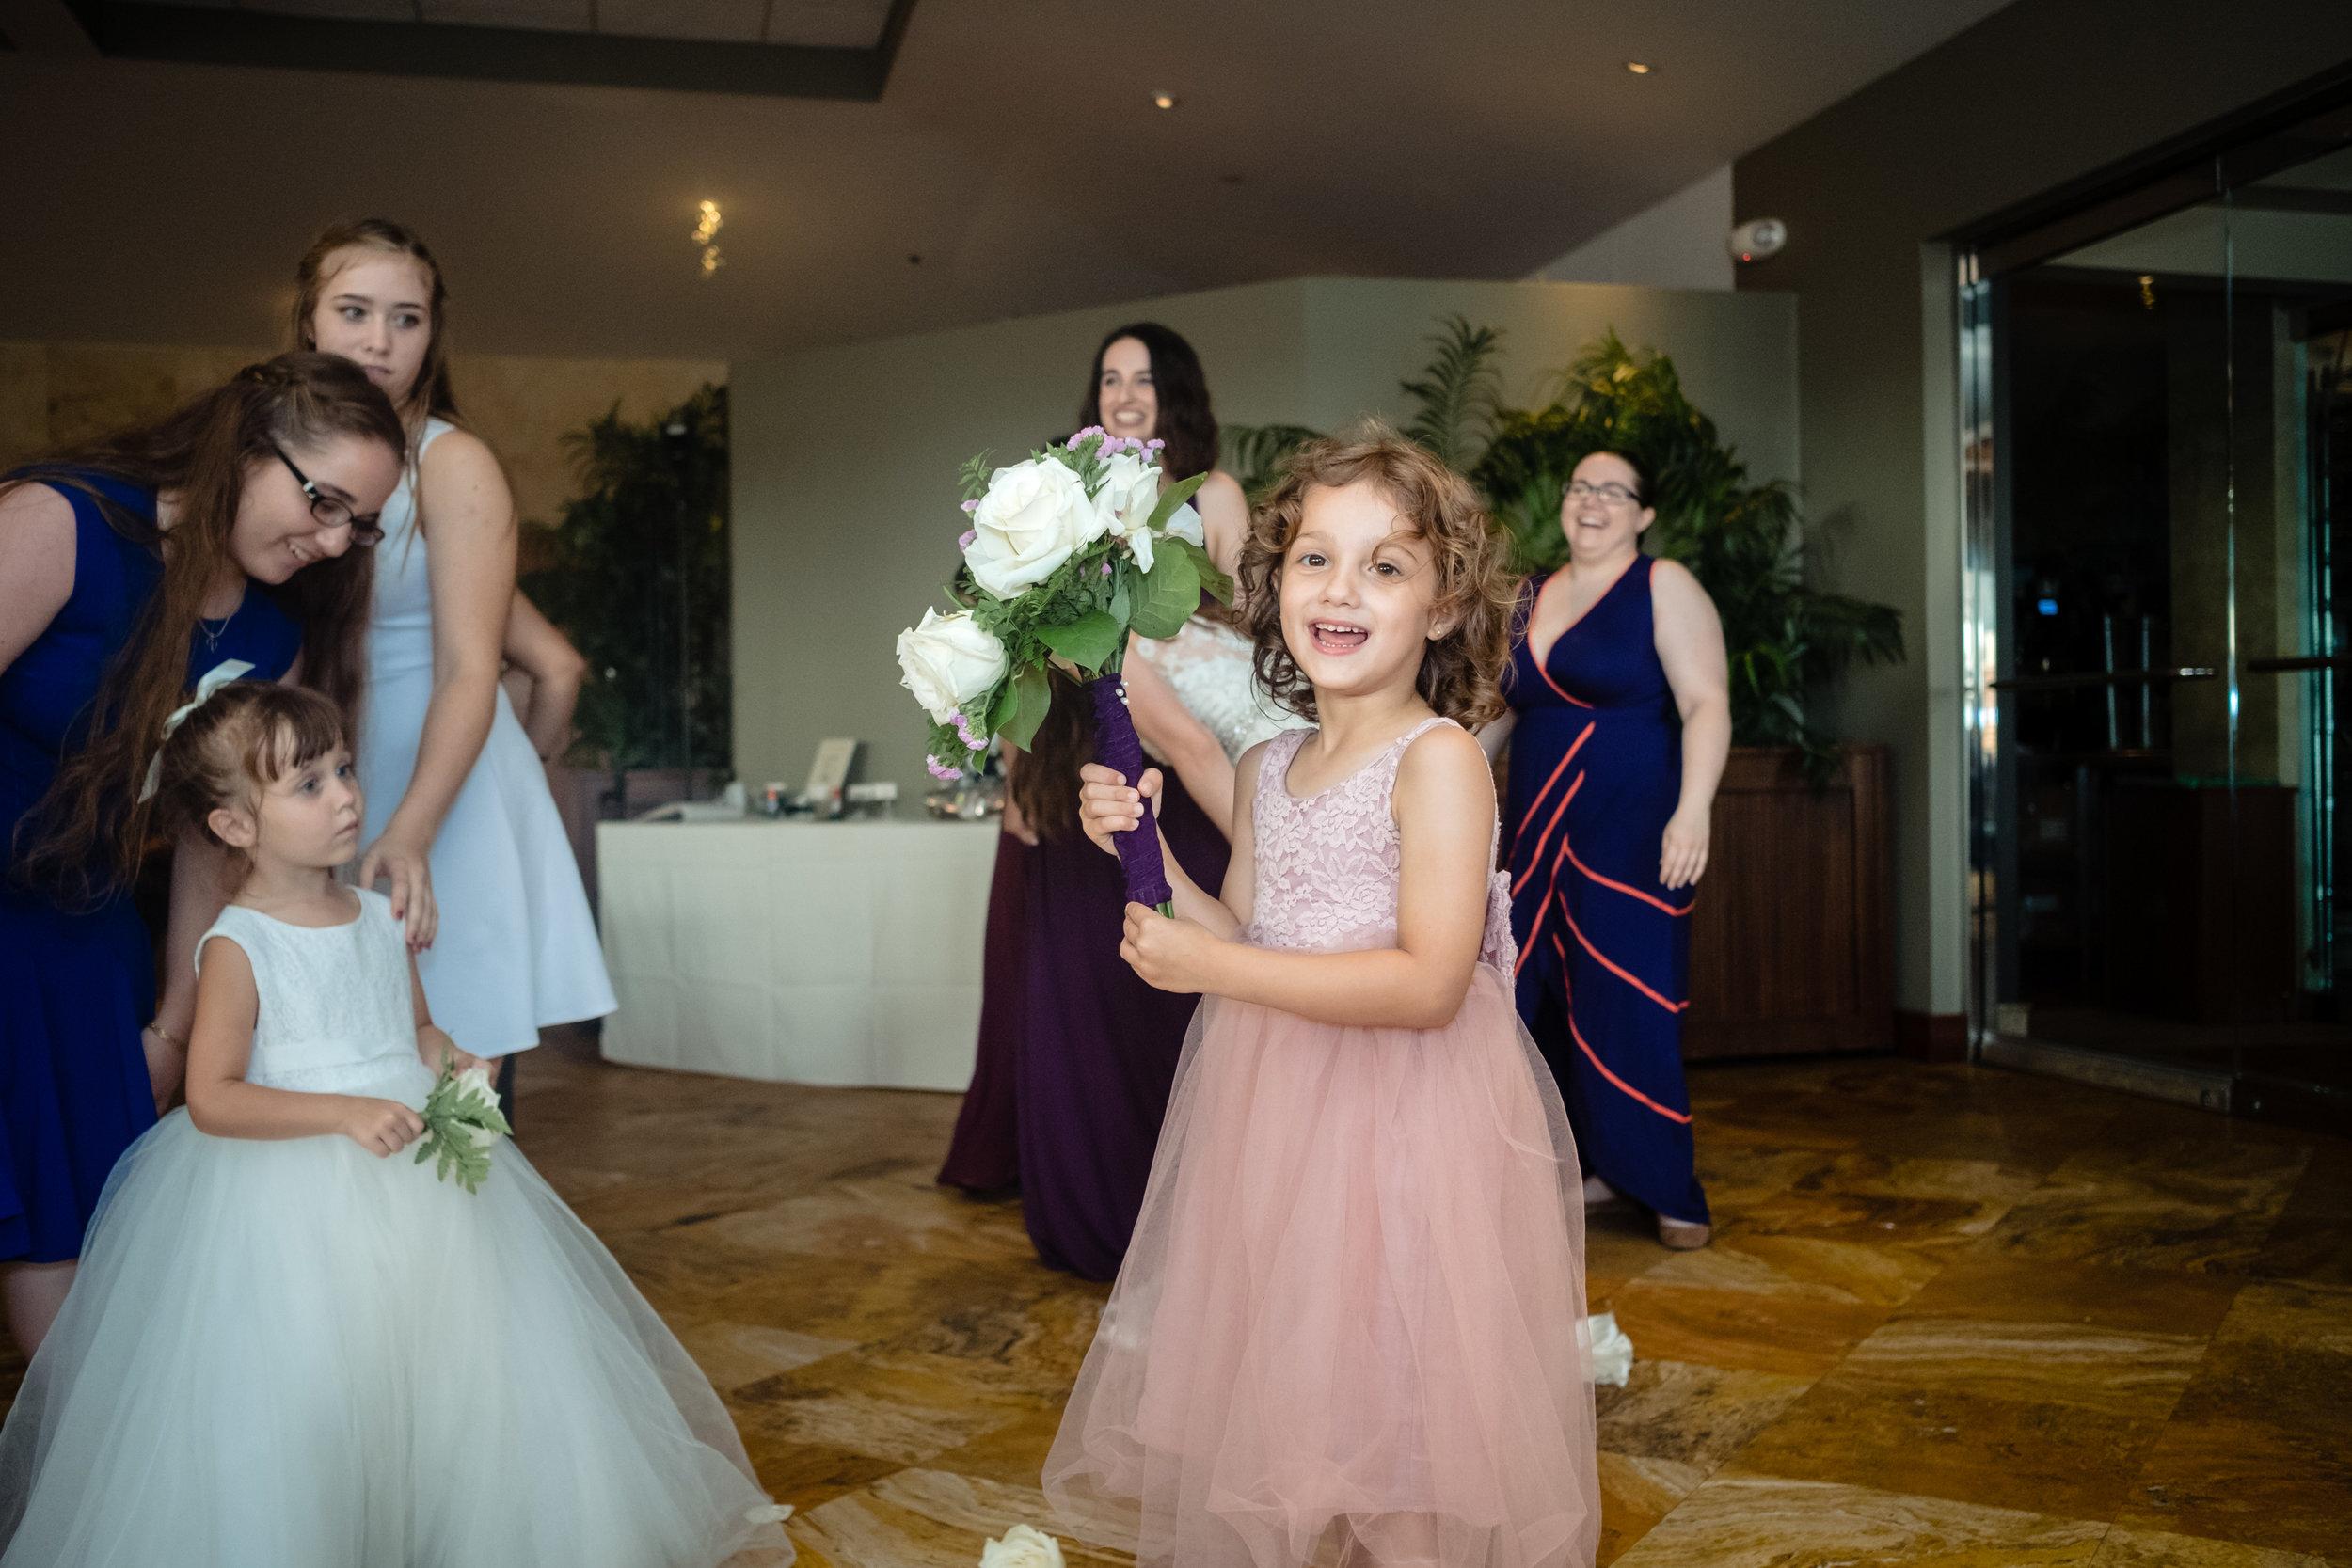 HAH_Zoe and Daniel_Clearwater Wedding_756_2018.jpg